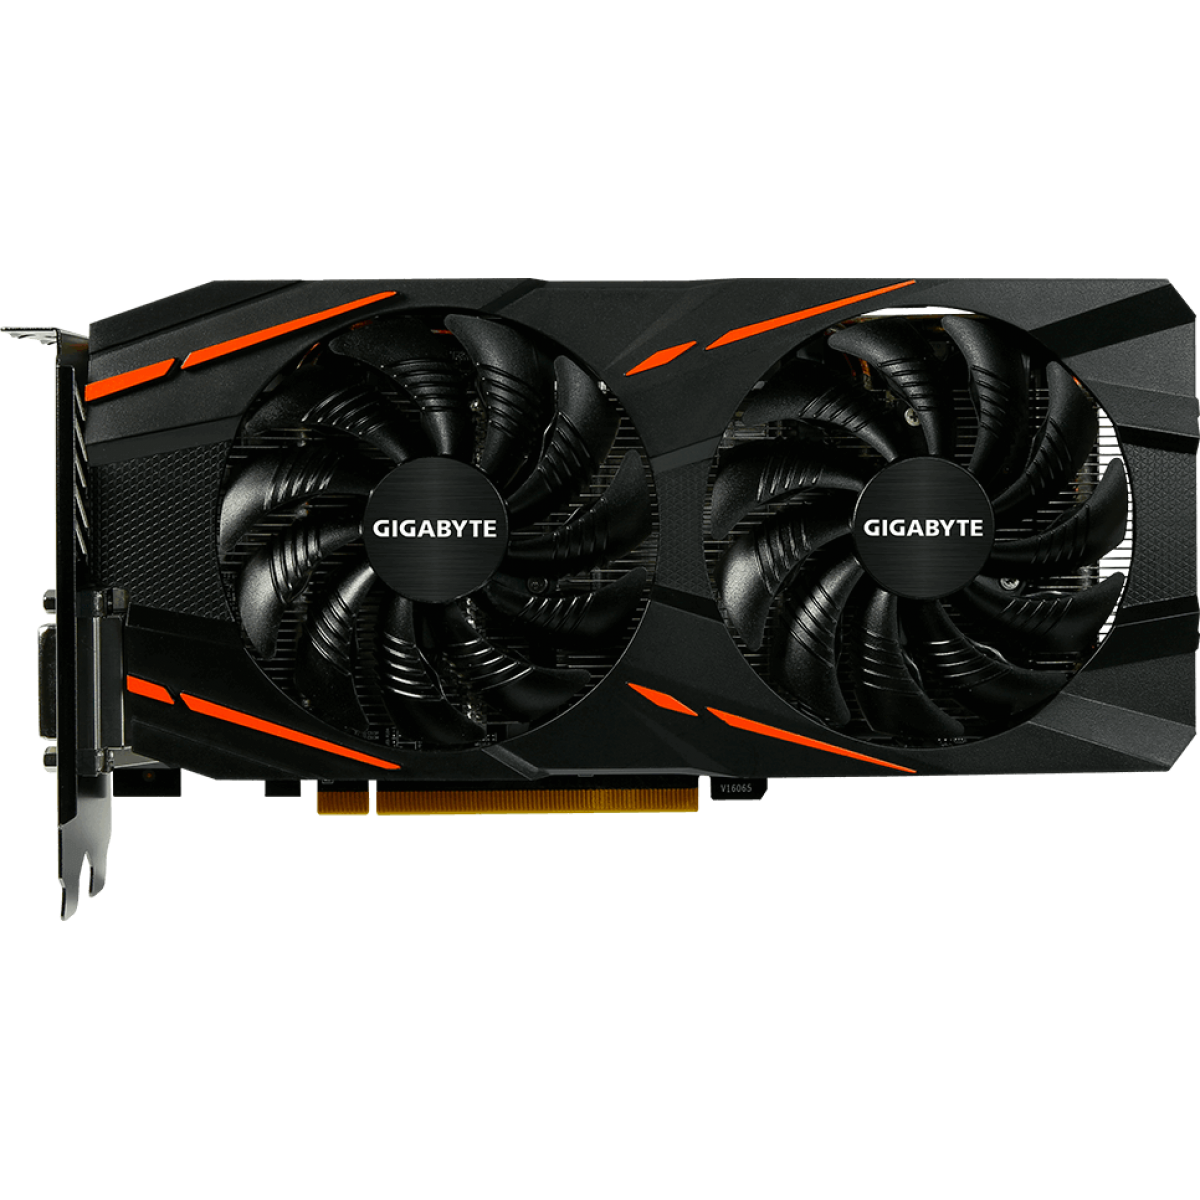 Placa de Vídeo Gigabyte Radeon RX 570 Gaming Dual, 4GB GDDR5, 256Bit, GV-RX570GAMING-4GD